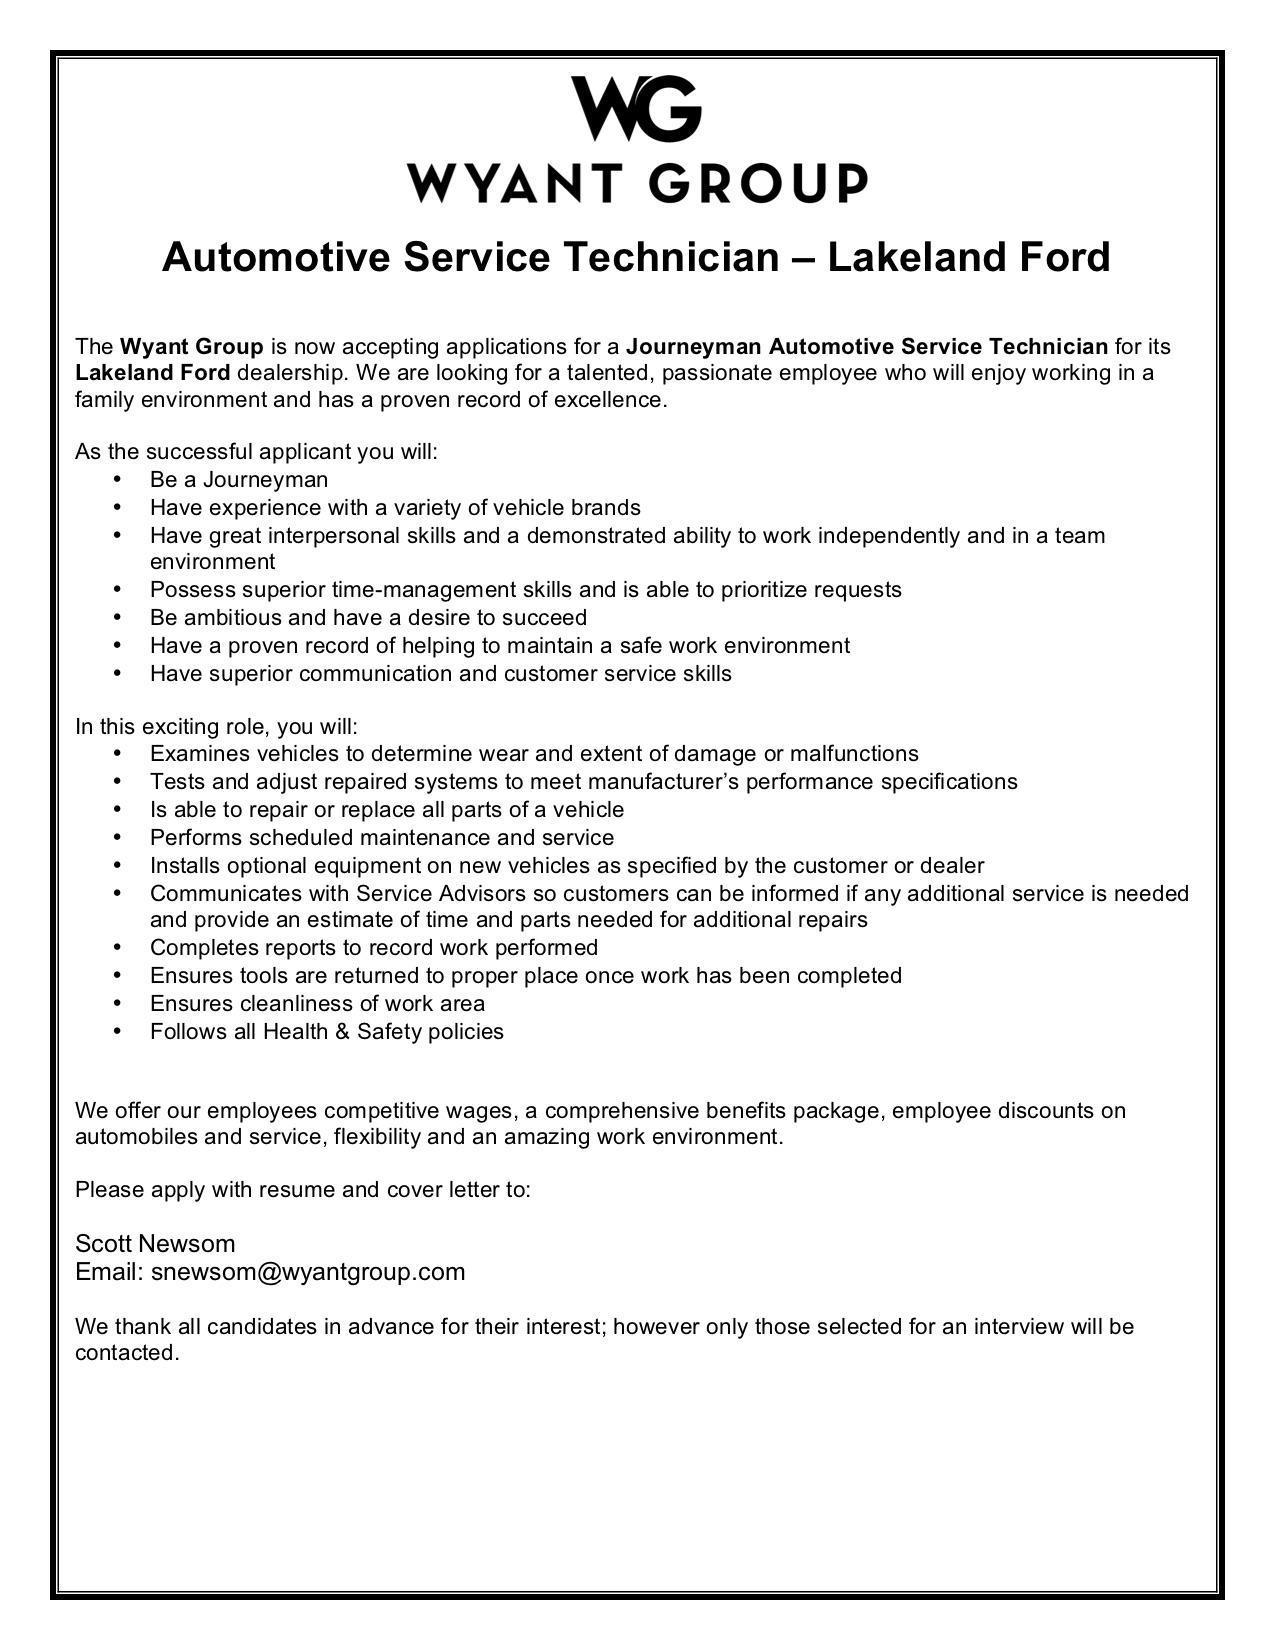 Lakeland Ford Journeyman Technician